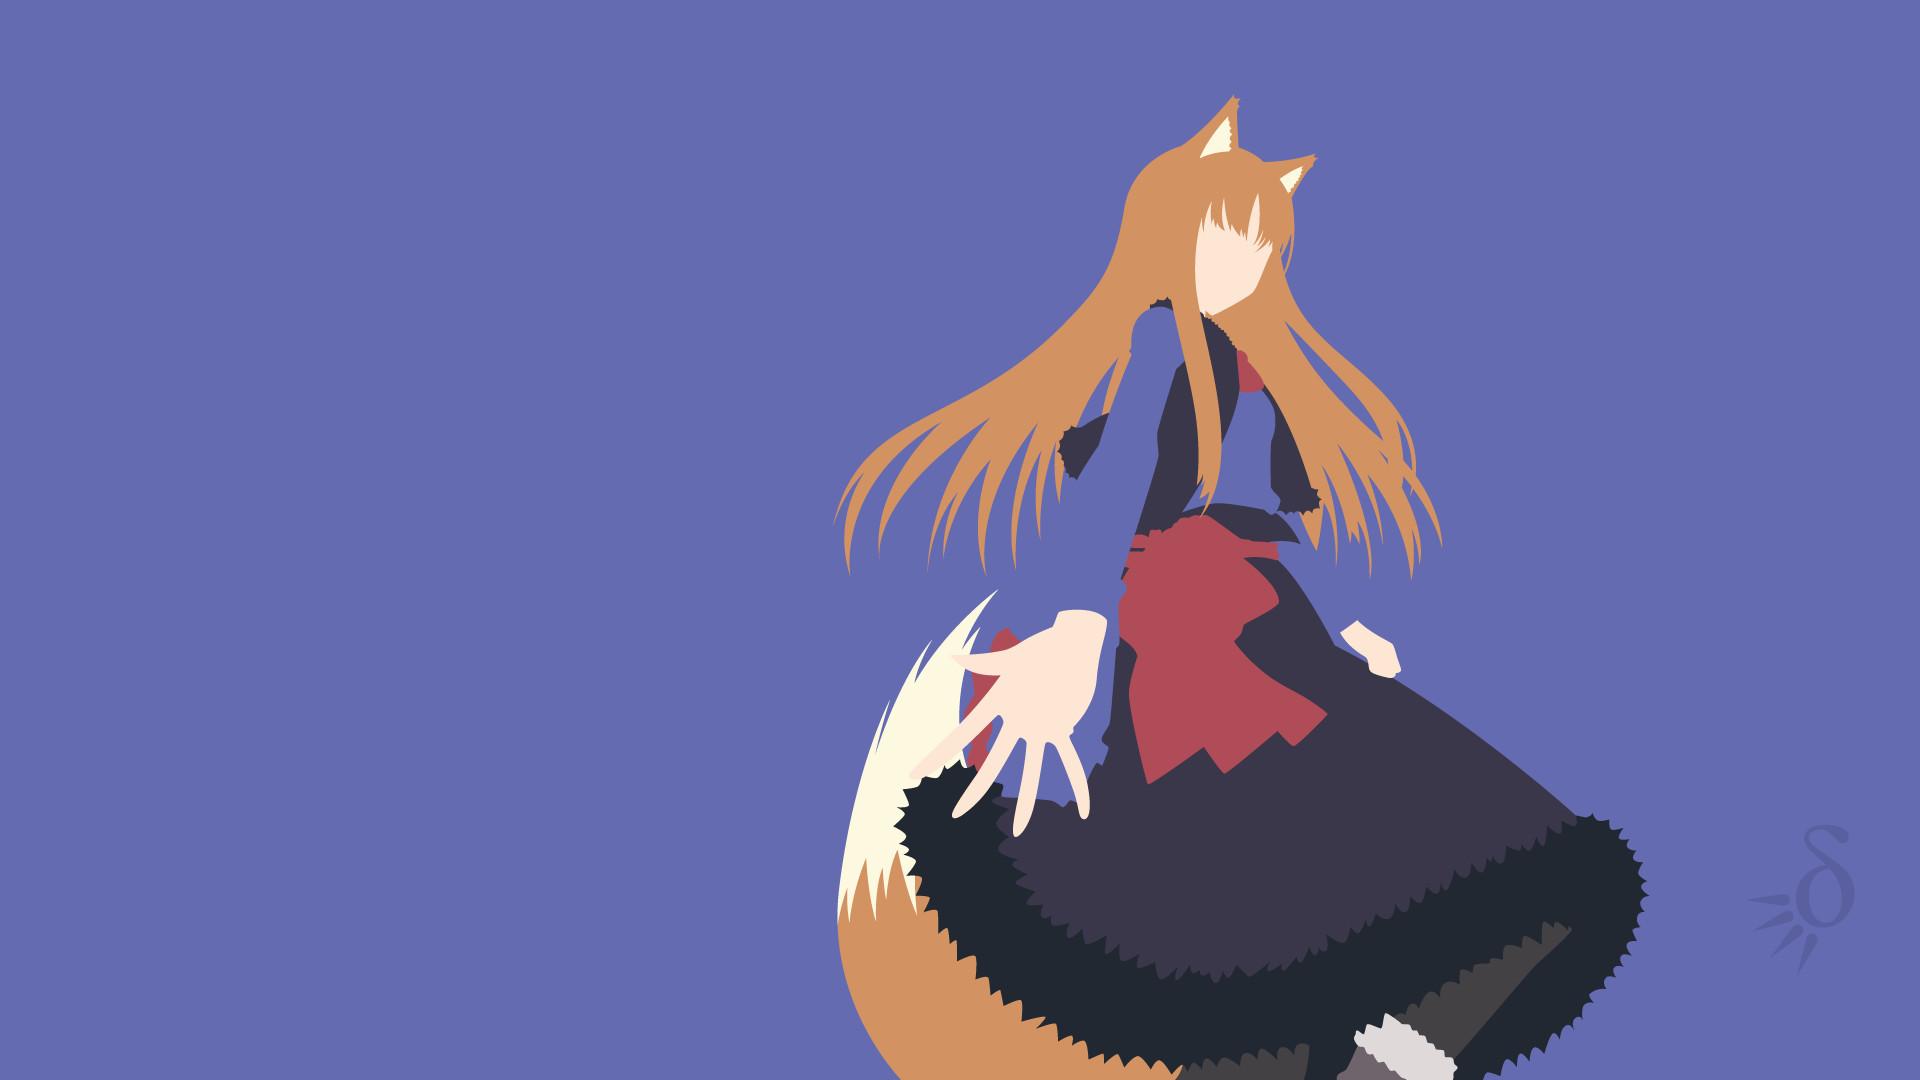 Minimalist Anime Wallpapers